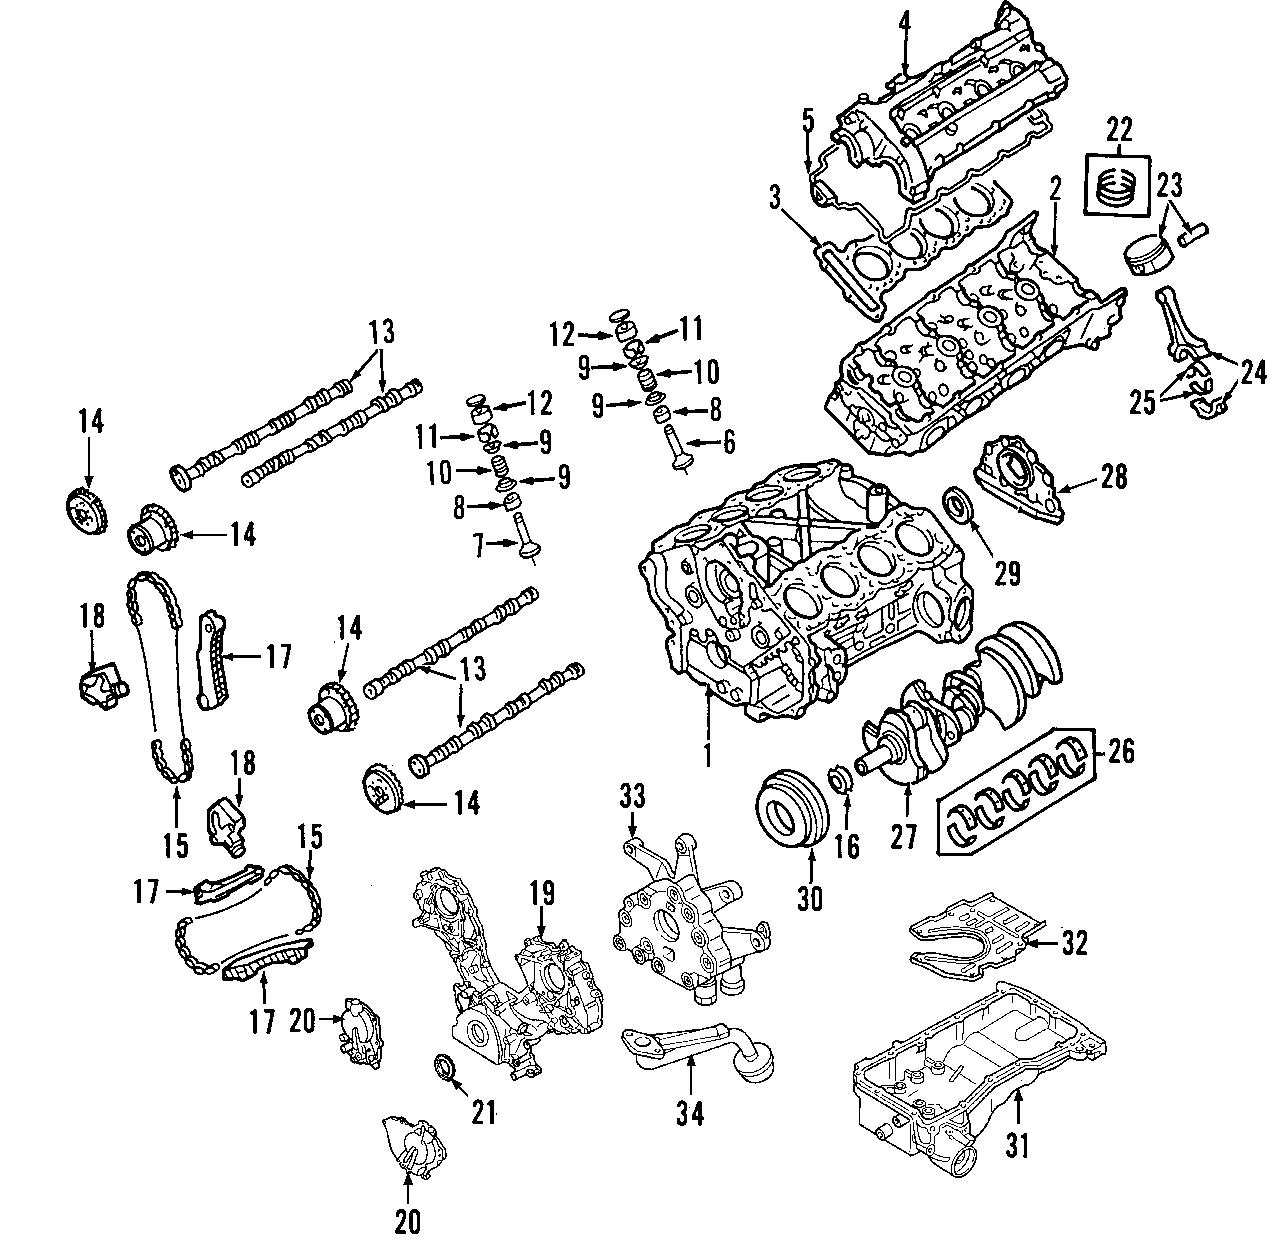 Nissan Armada Engine Valve Spring Retainer